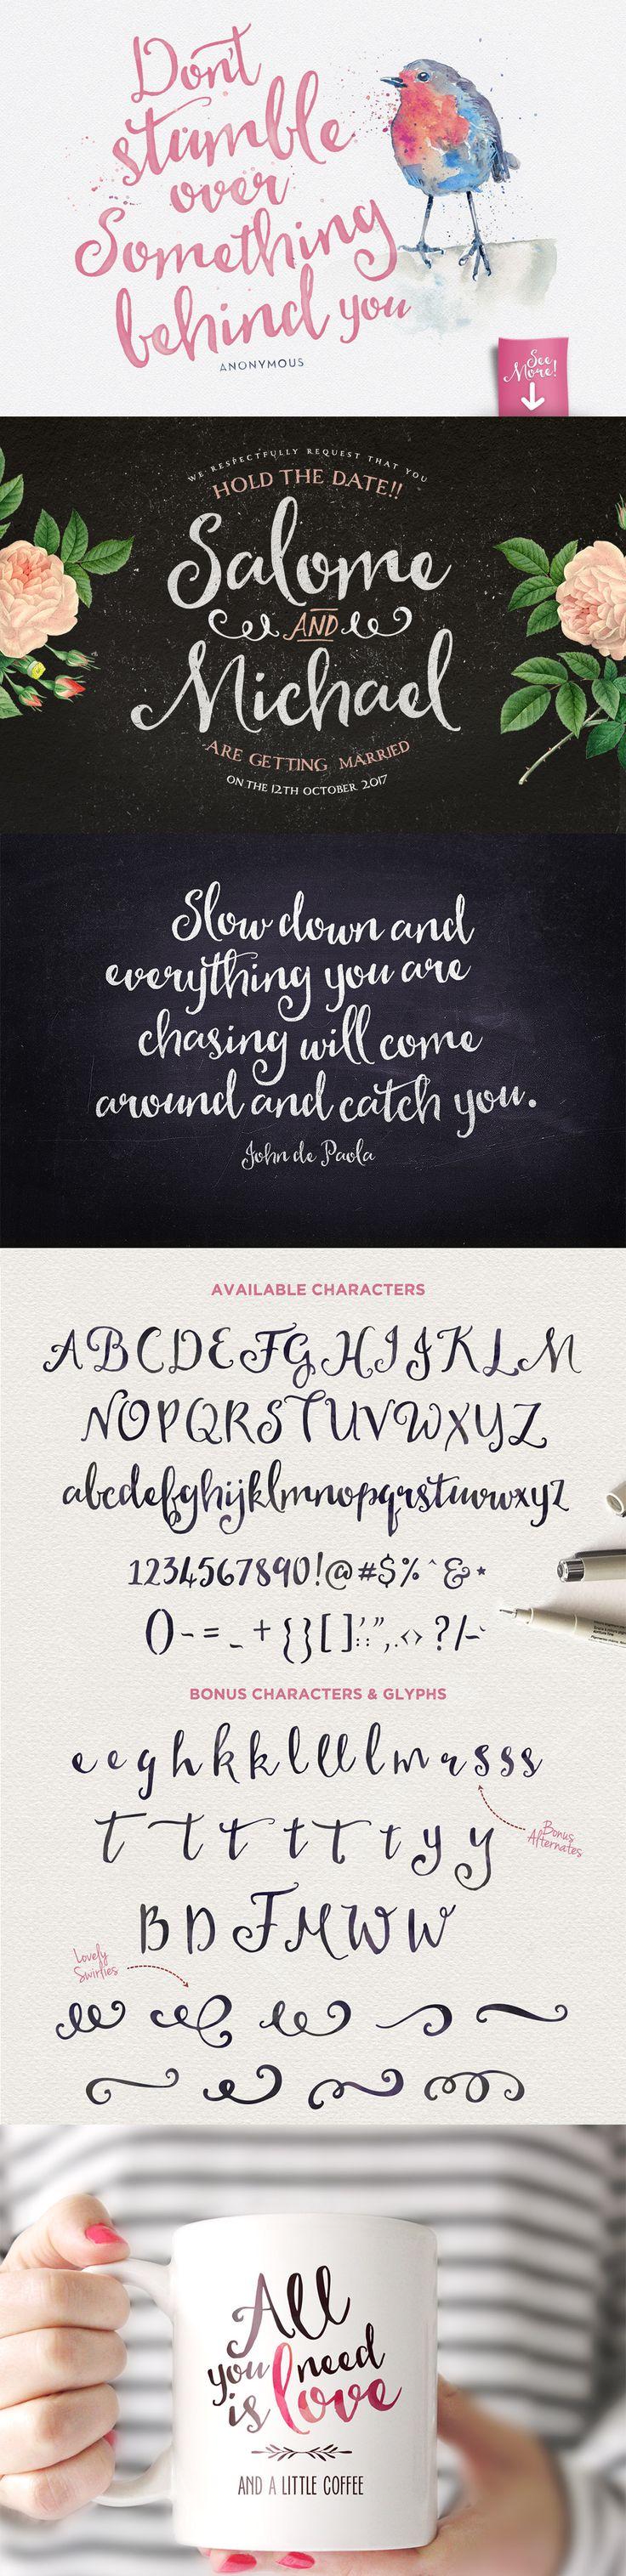 Heart & Soul Typeface #font #typography #design Download: https://creativemarket.com/Nickylaatz/199455-Heart-Soul-Typeface?u=nexion